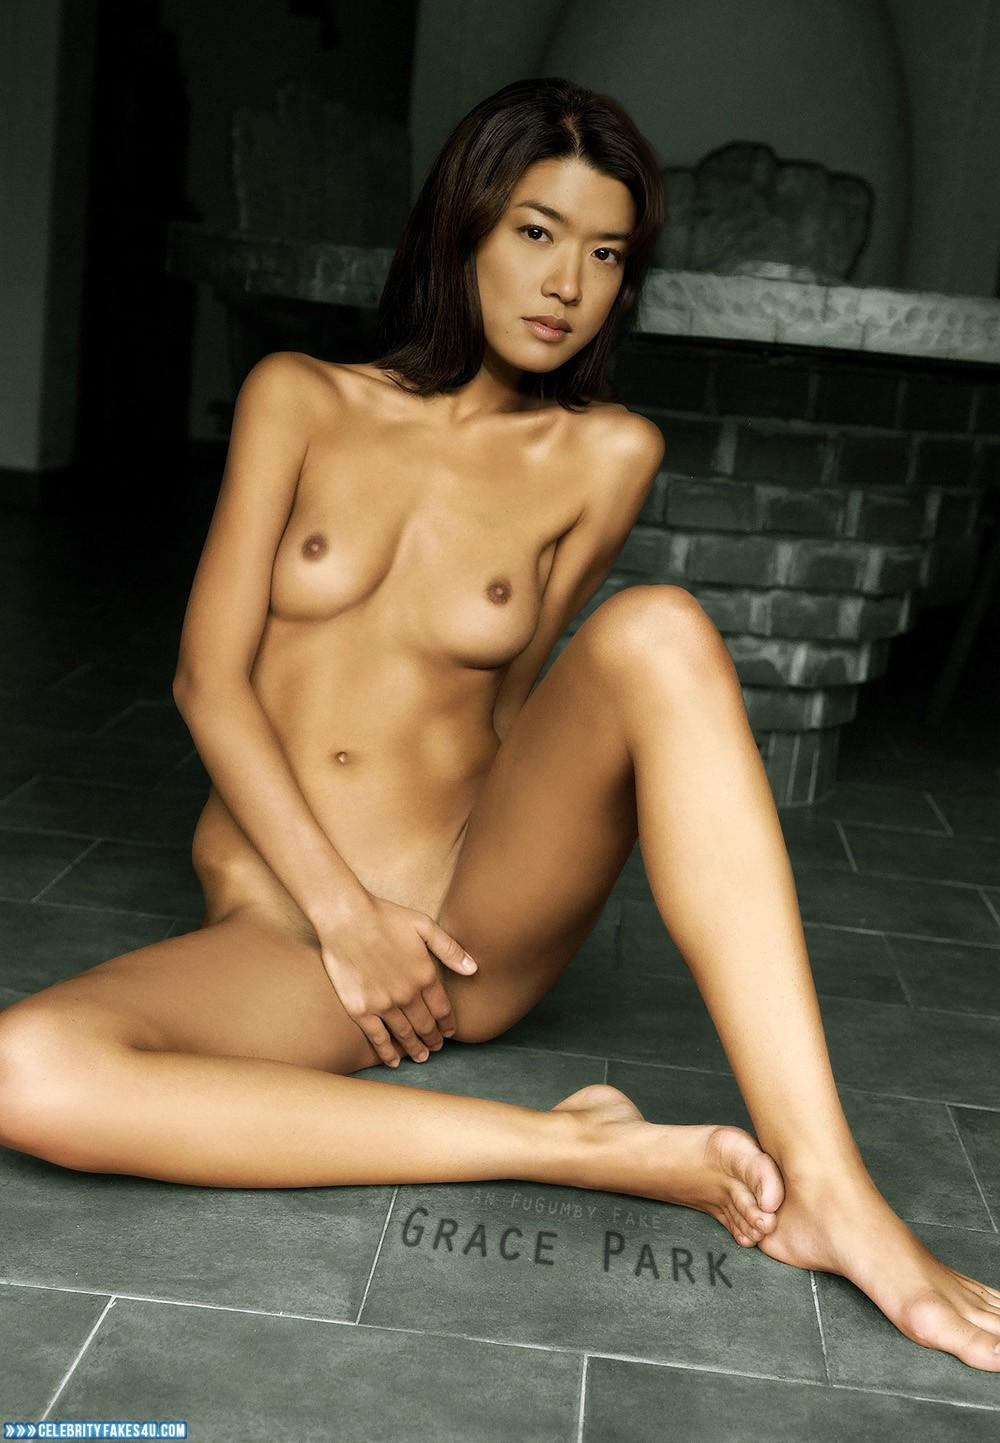 Sexy women grace park fucks porno pictures